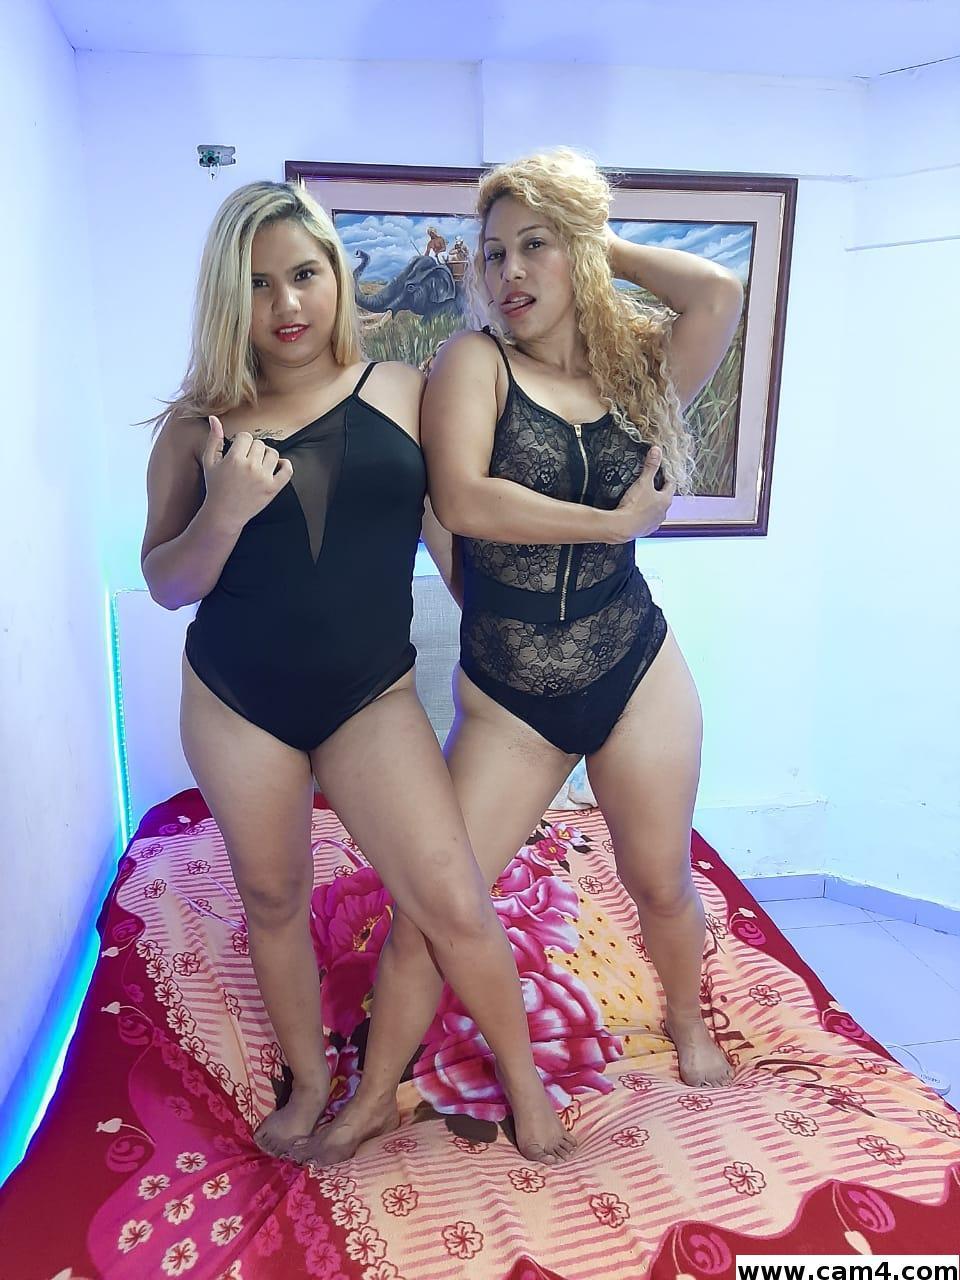 Girlsplayroom?s=uqxmdphmvpdu7z5vkjswrjgkerrdp+bhv3oymuknzsu=